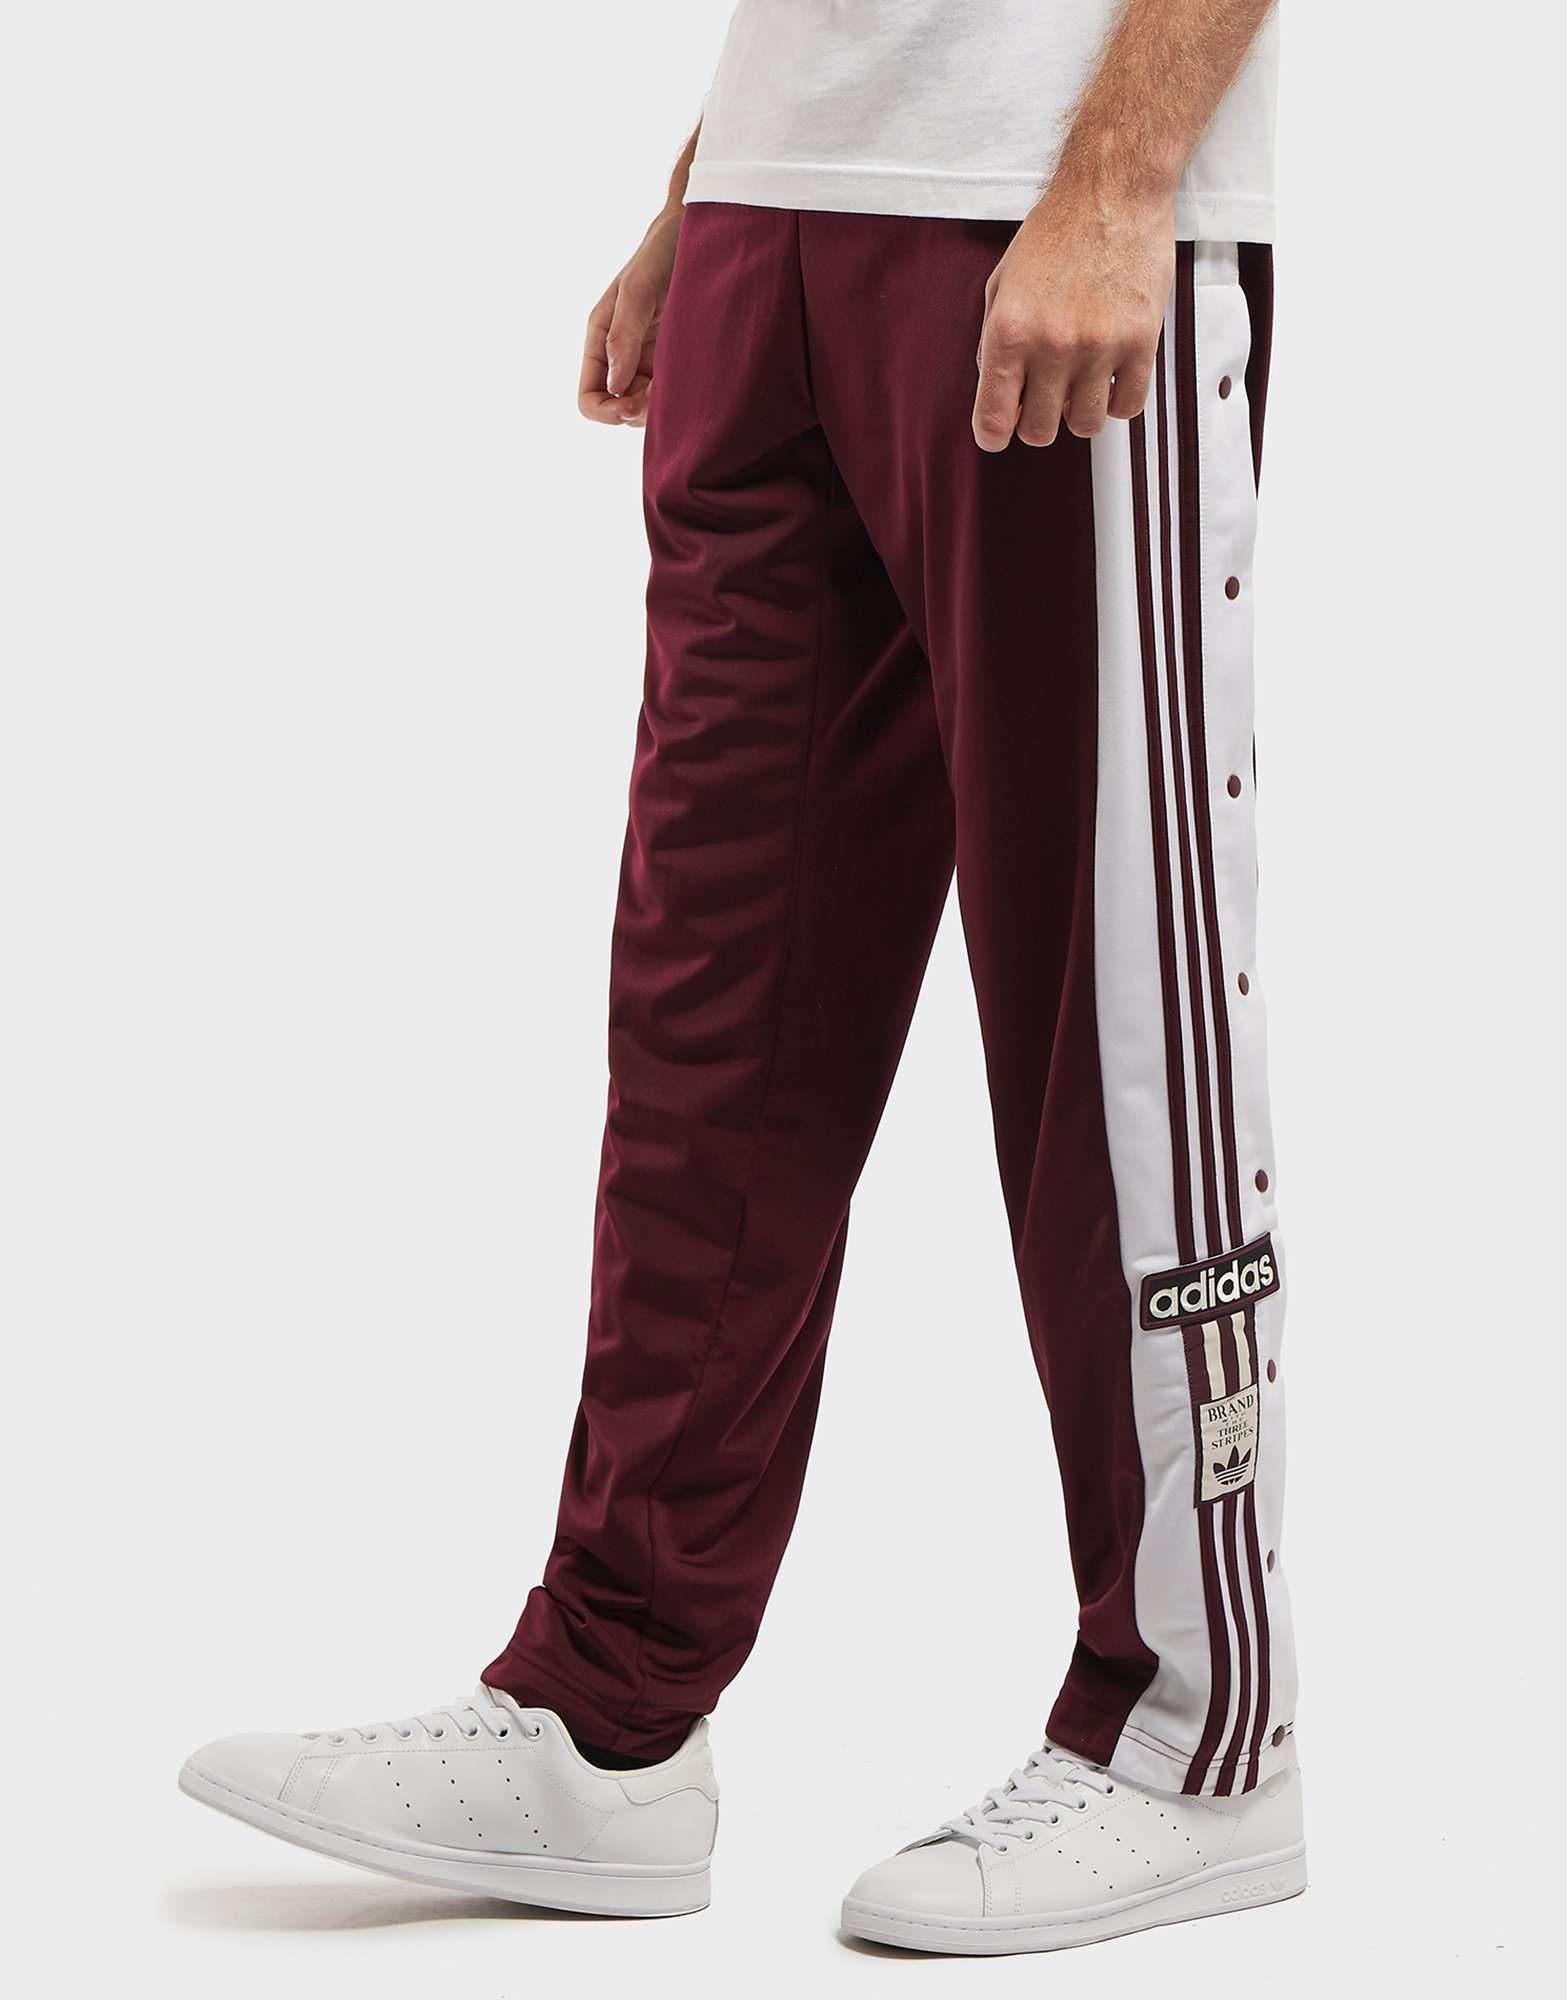 38c29f93fdda adidas Originals Adibreak Track Pants